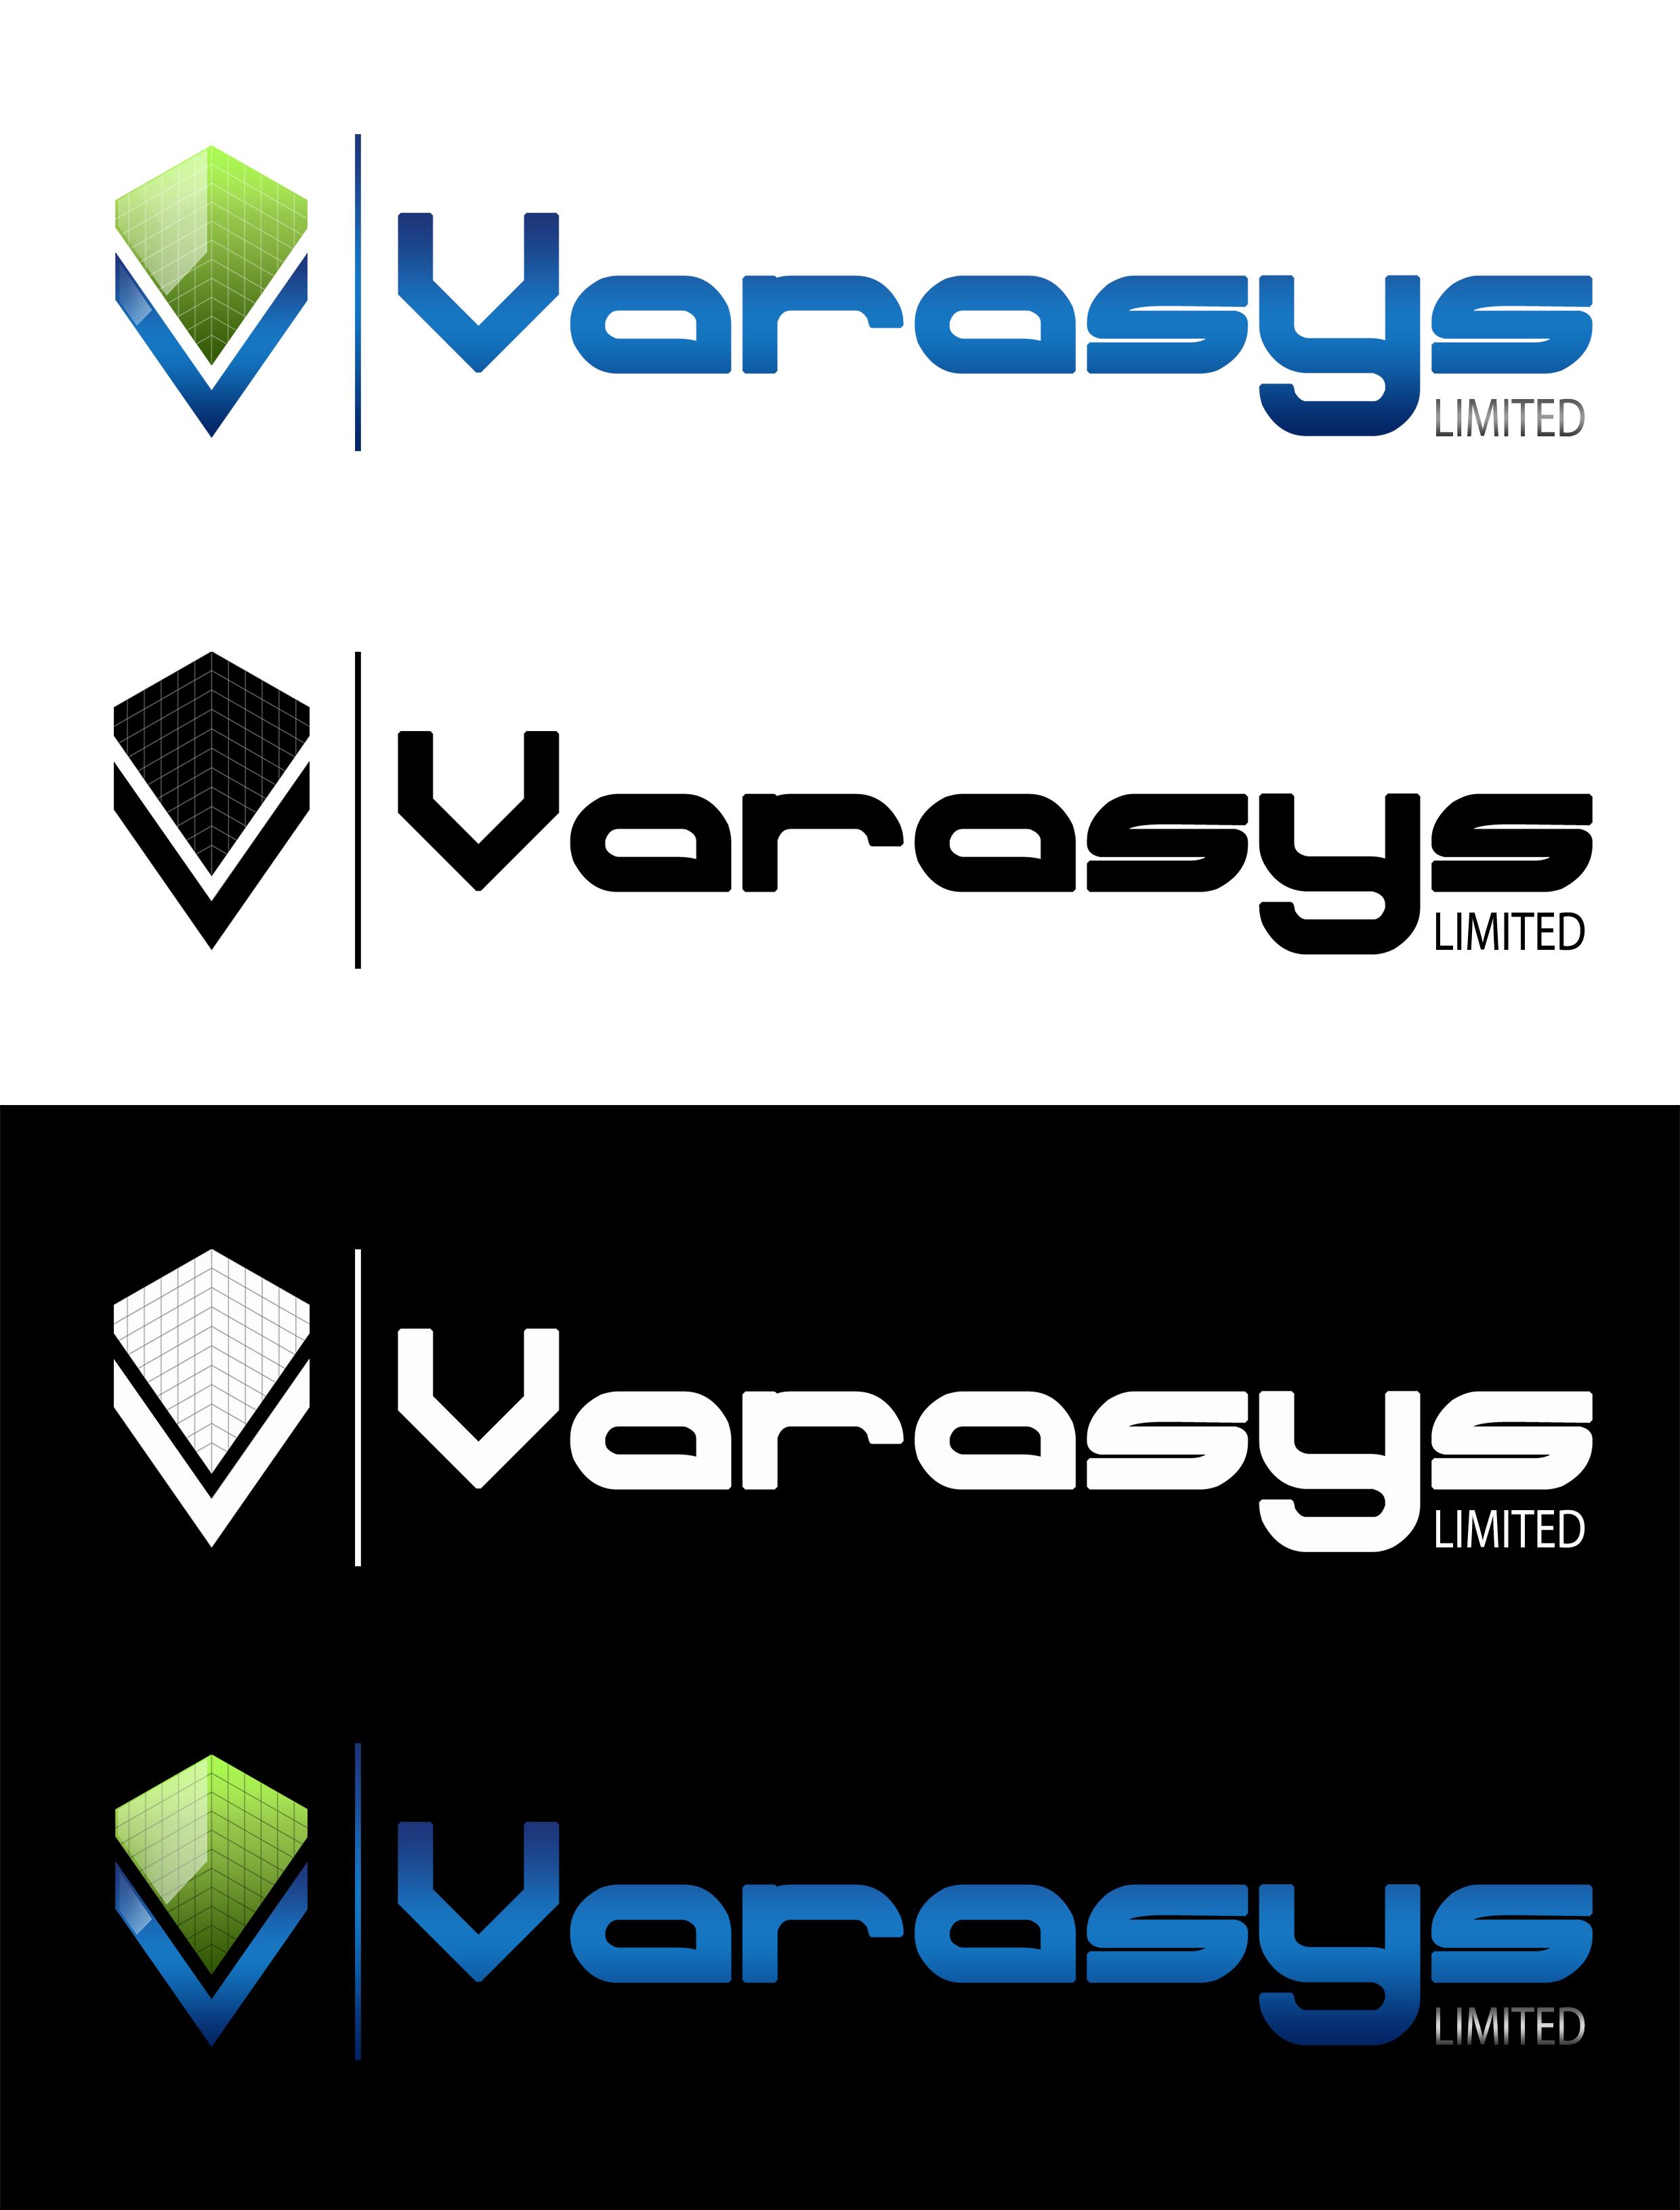 Logo Design by JSDESIGNGROUP - Entry No. 118 in the Logo Design Contest Artistic Logo Design for VARASYS Limited.